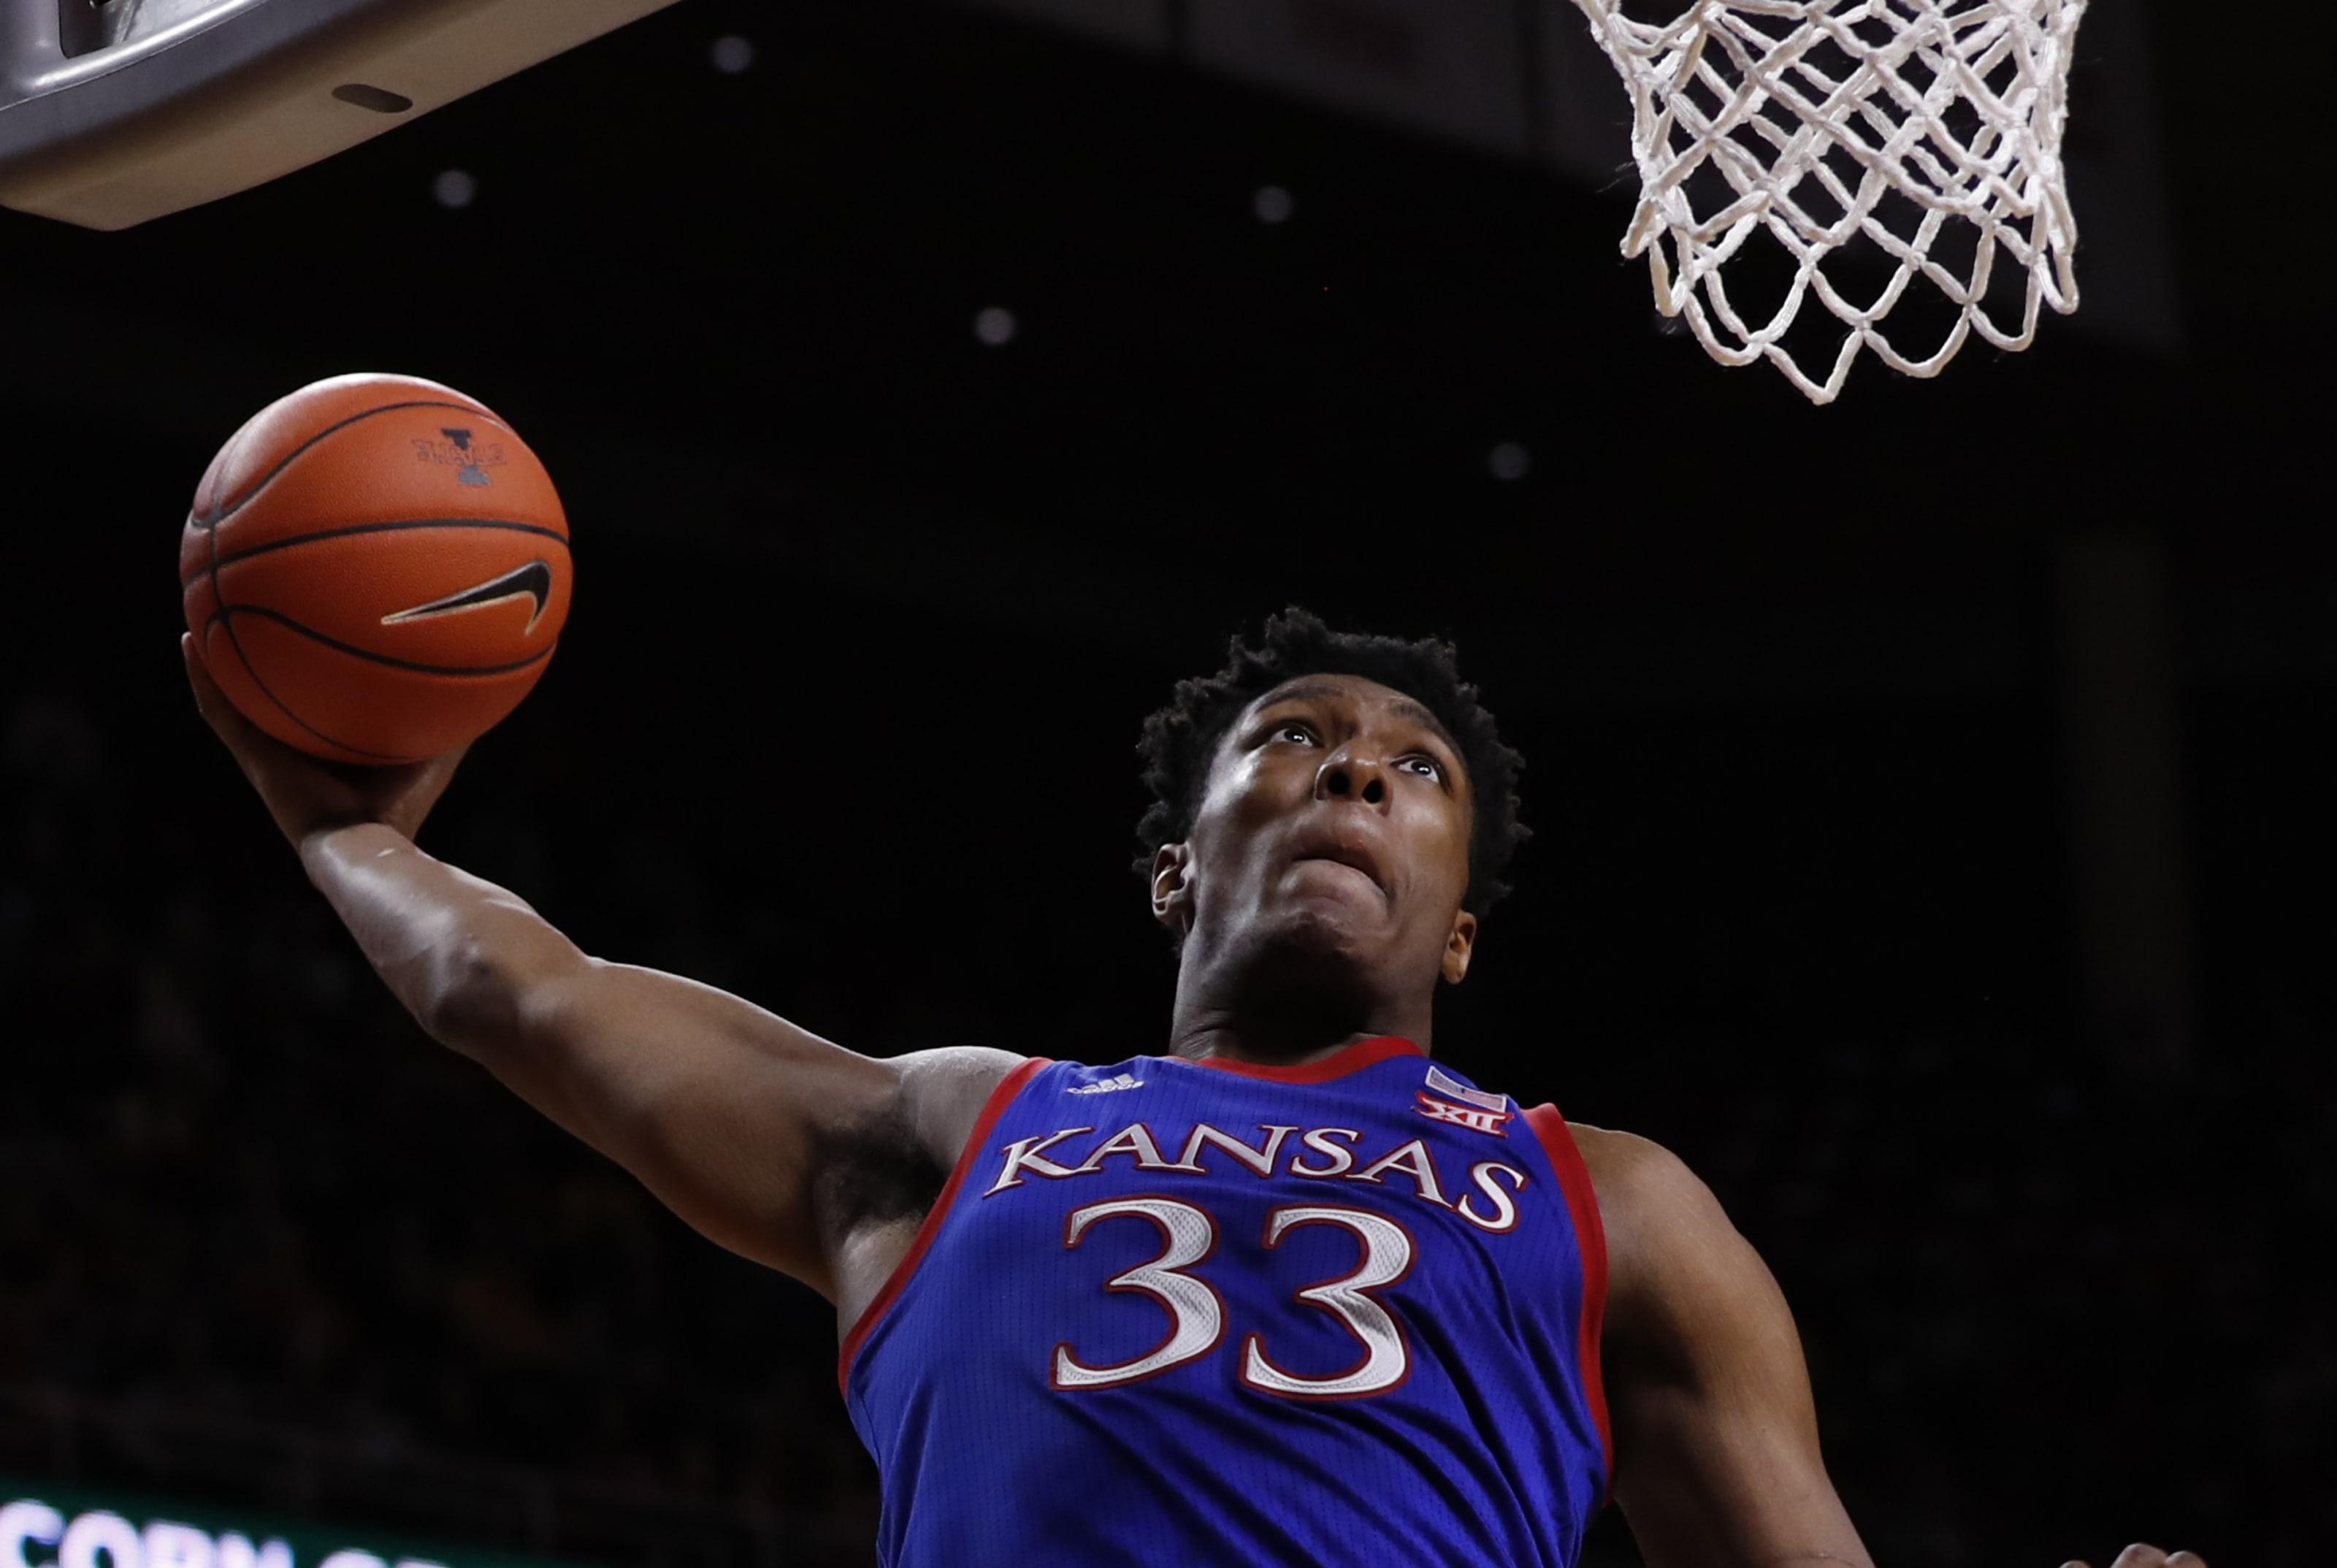 Gonzaga Basketball: 5 keys to beat Kansas to open 2020-21 ...Gonzaga Basketball